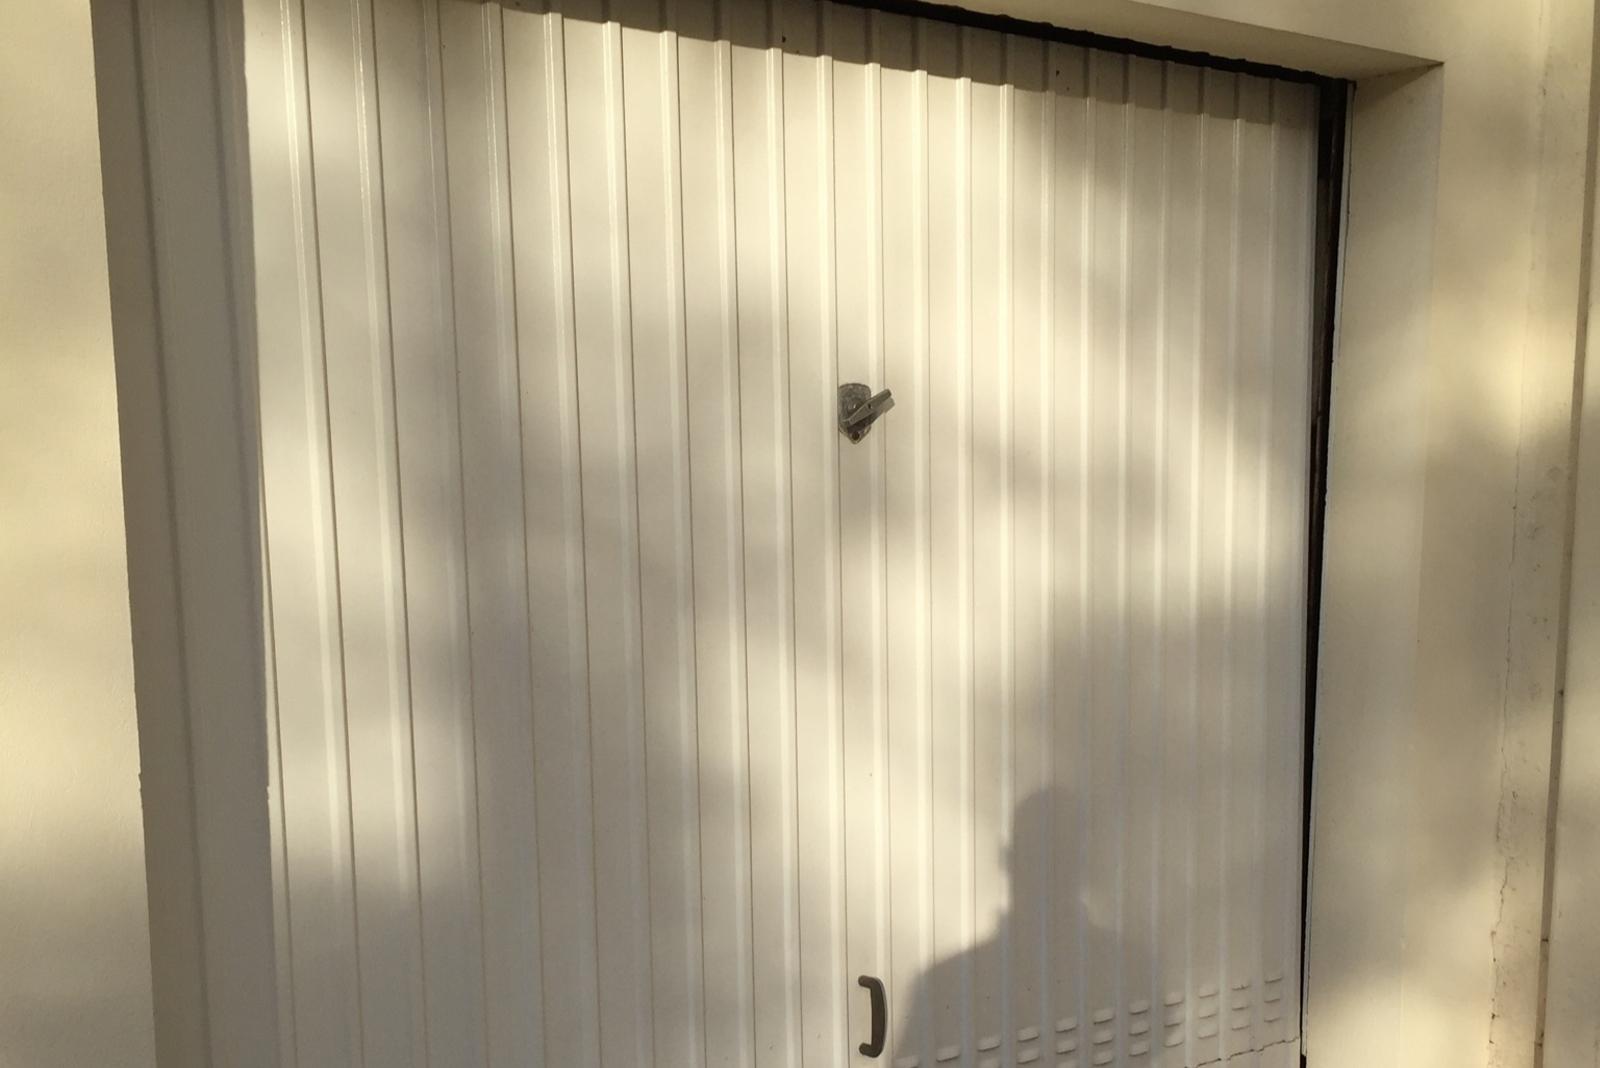 Porte de garage basculante pose et installation dans le Var - Sud Alu